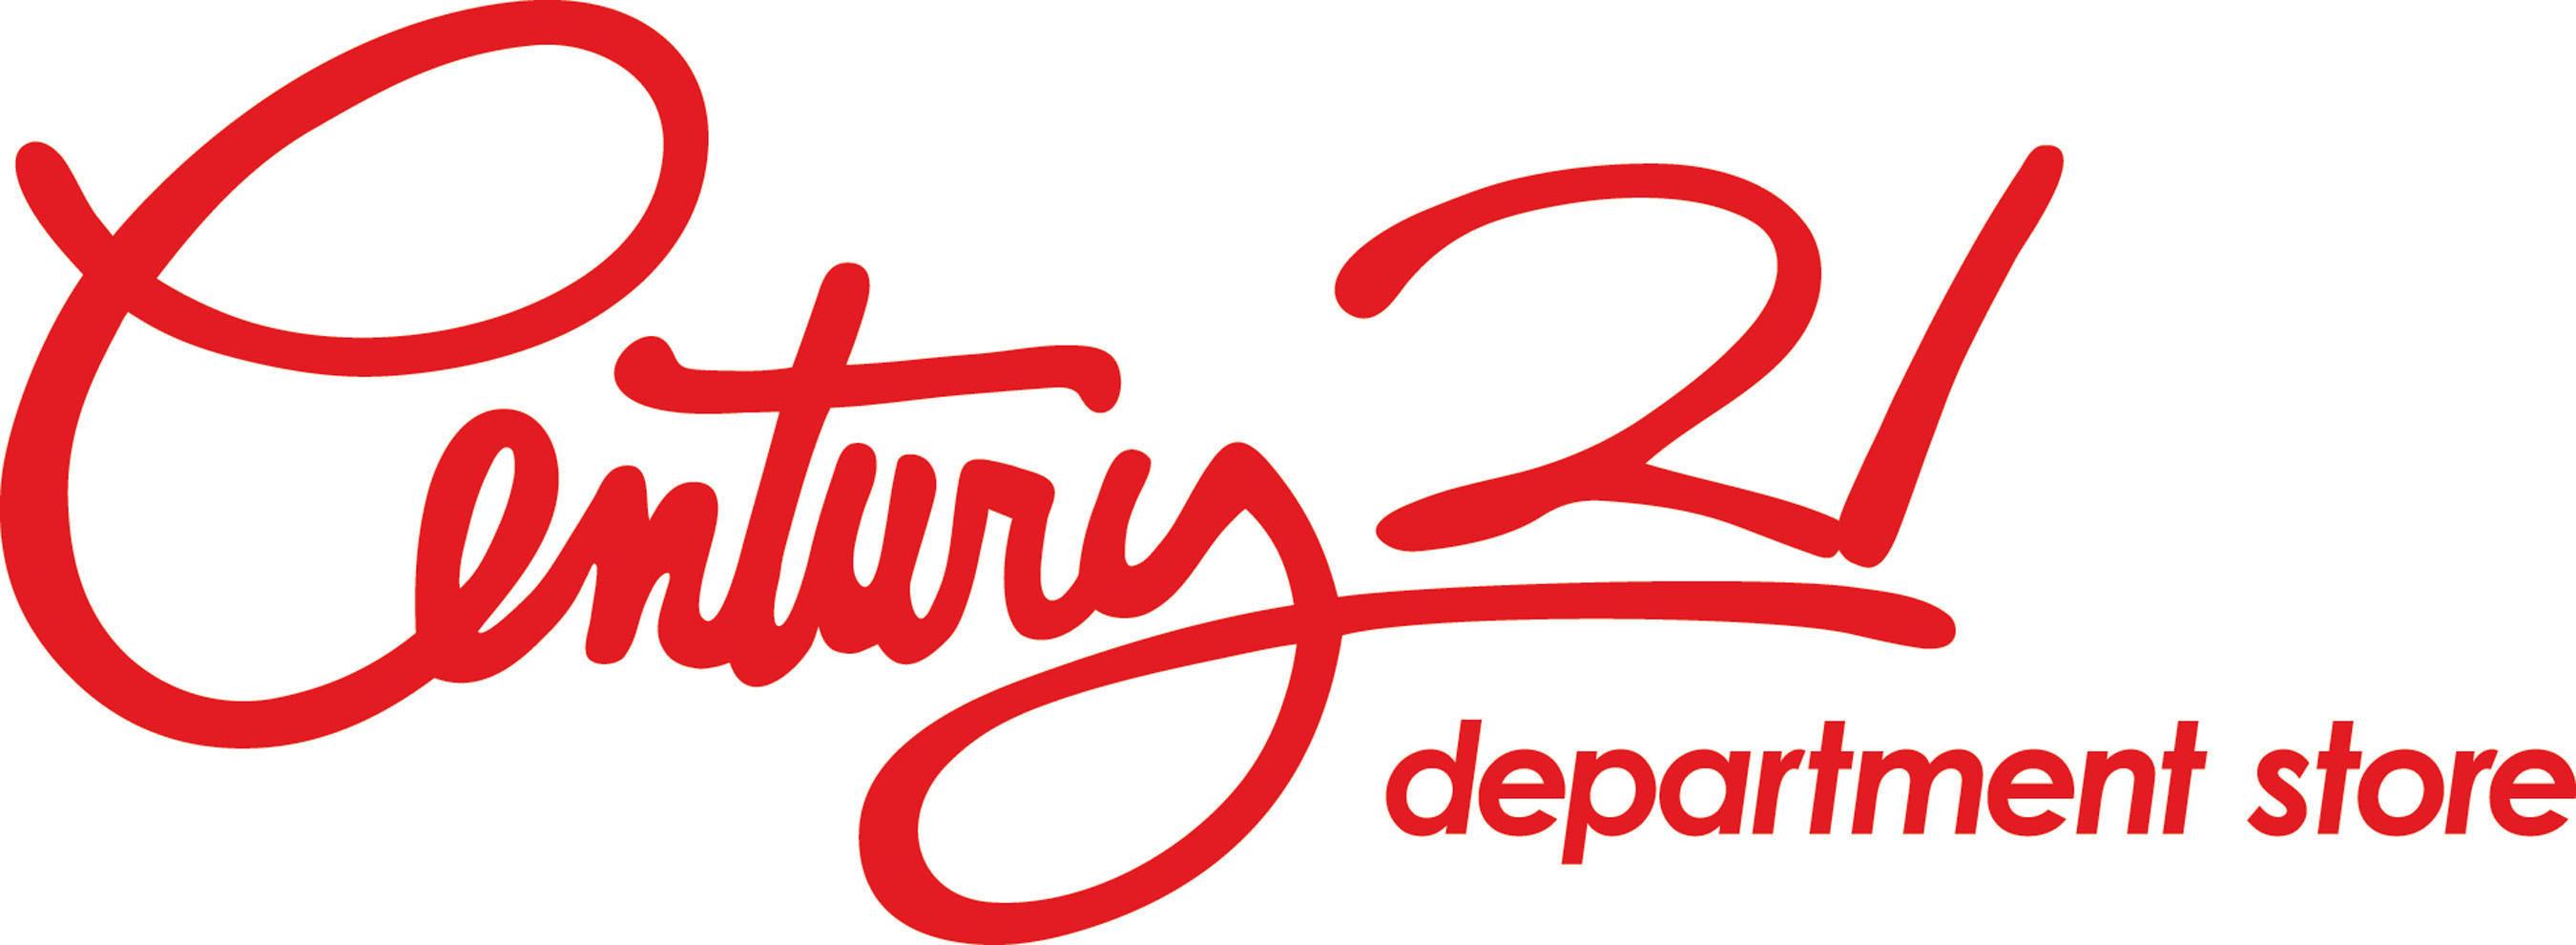 Century 21 Department Store Launches E-Commerce - Visit www.c21stores.com.